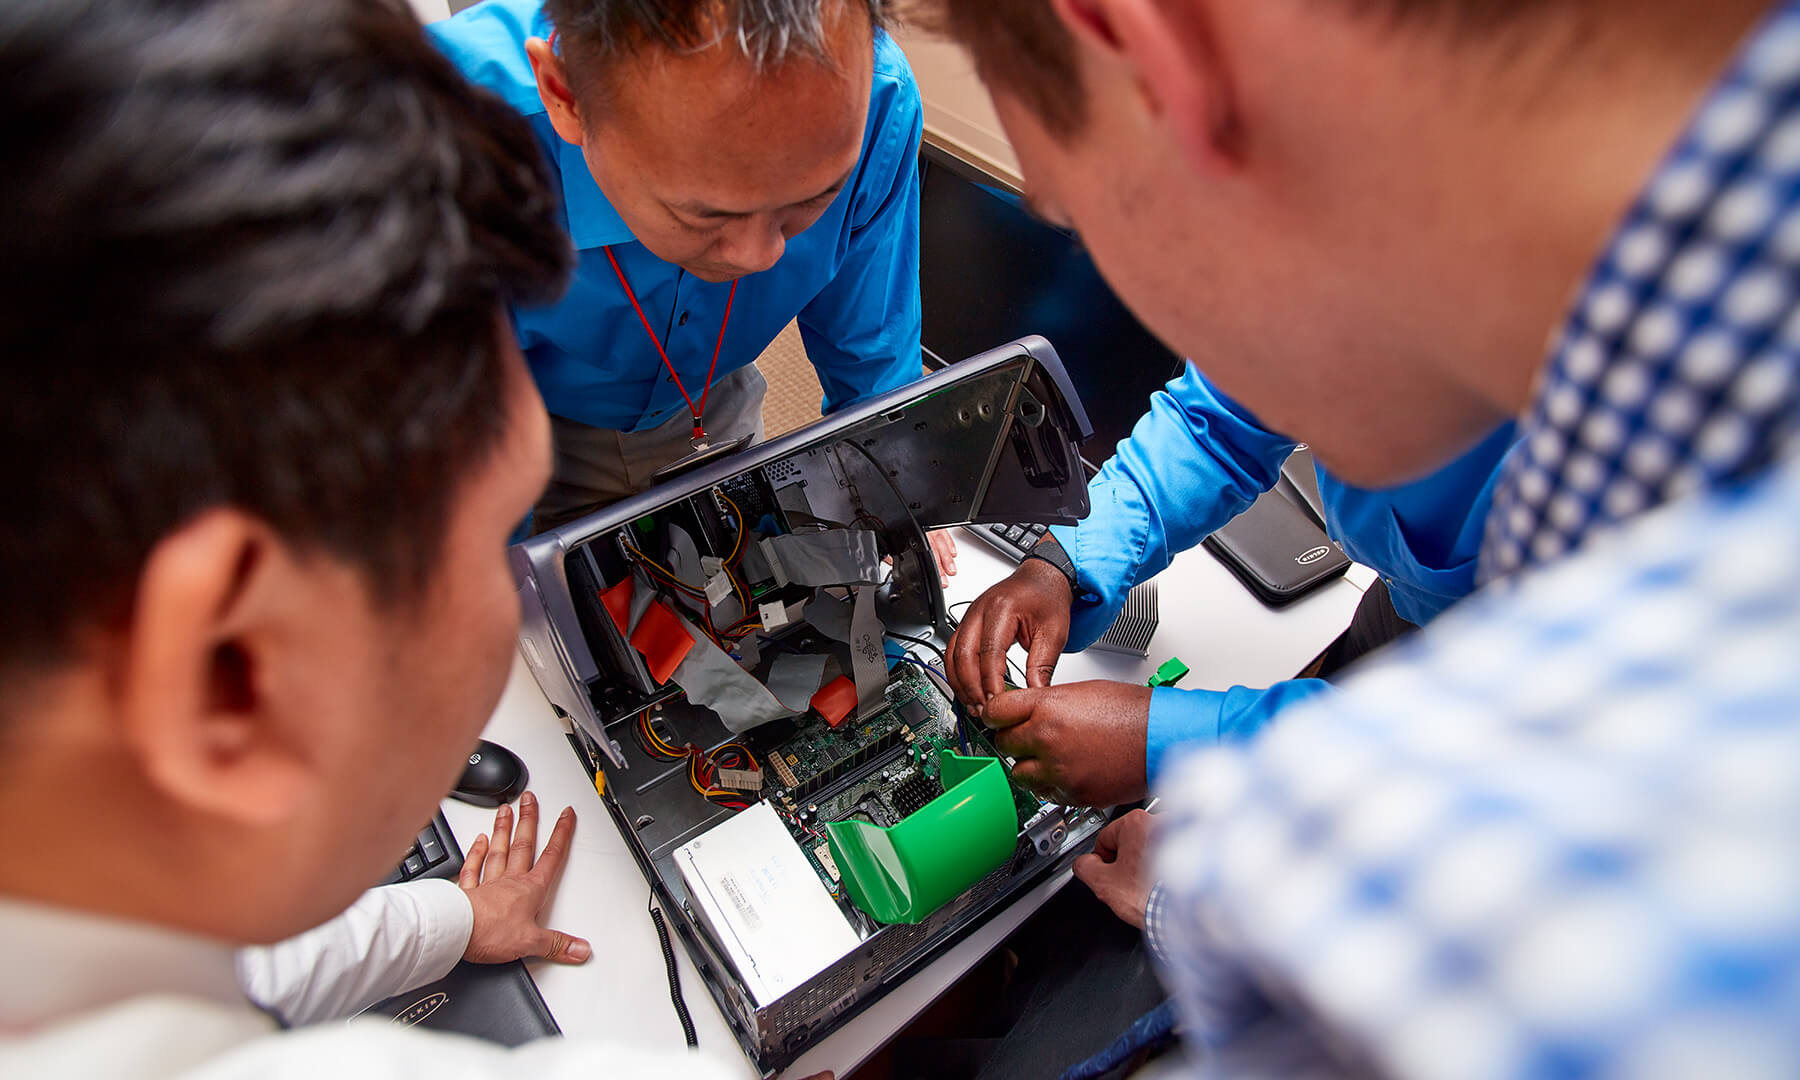 Creating IT Futures Opens Free IT Training & Career Program